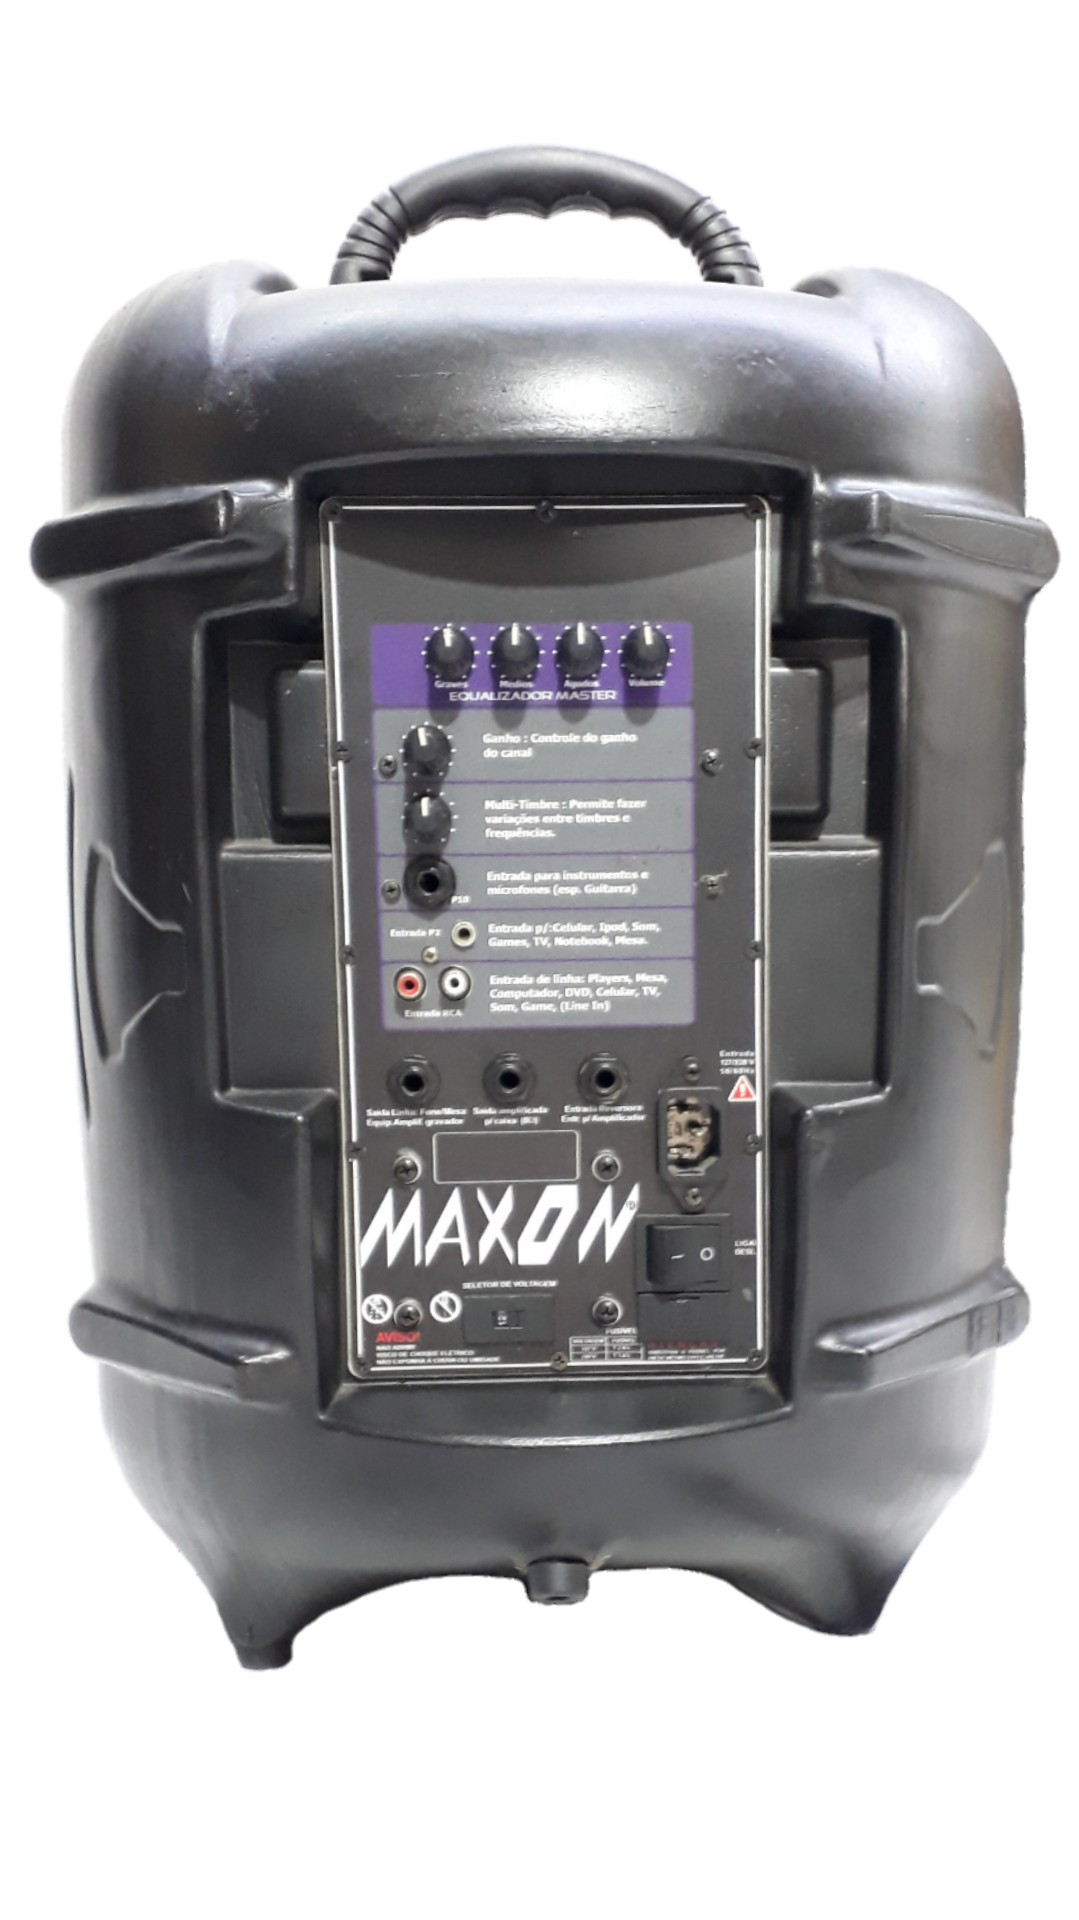 Caixa Amplificada Maxon Pe10 Turbinada Falante10.5 1canal Ativa Reversor Alimenta Passiva357wref